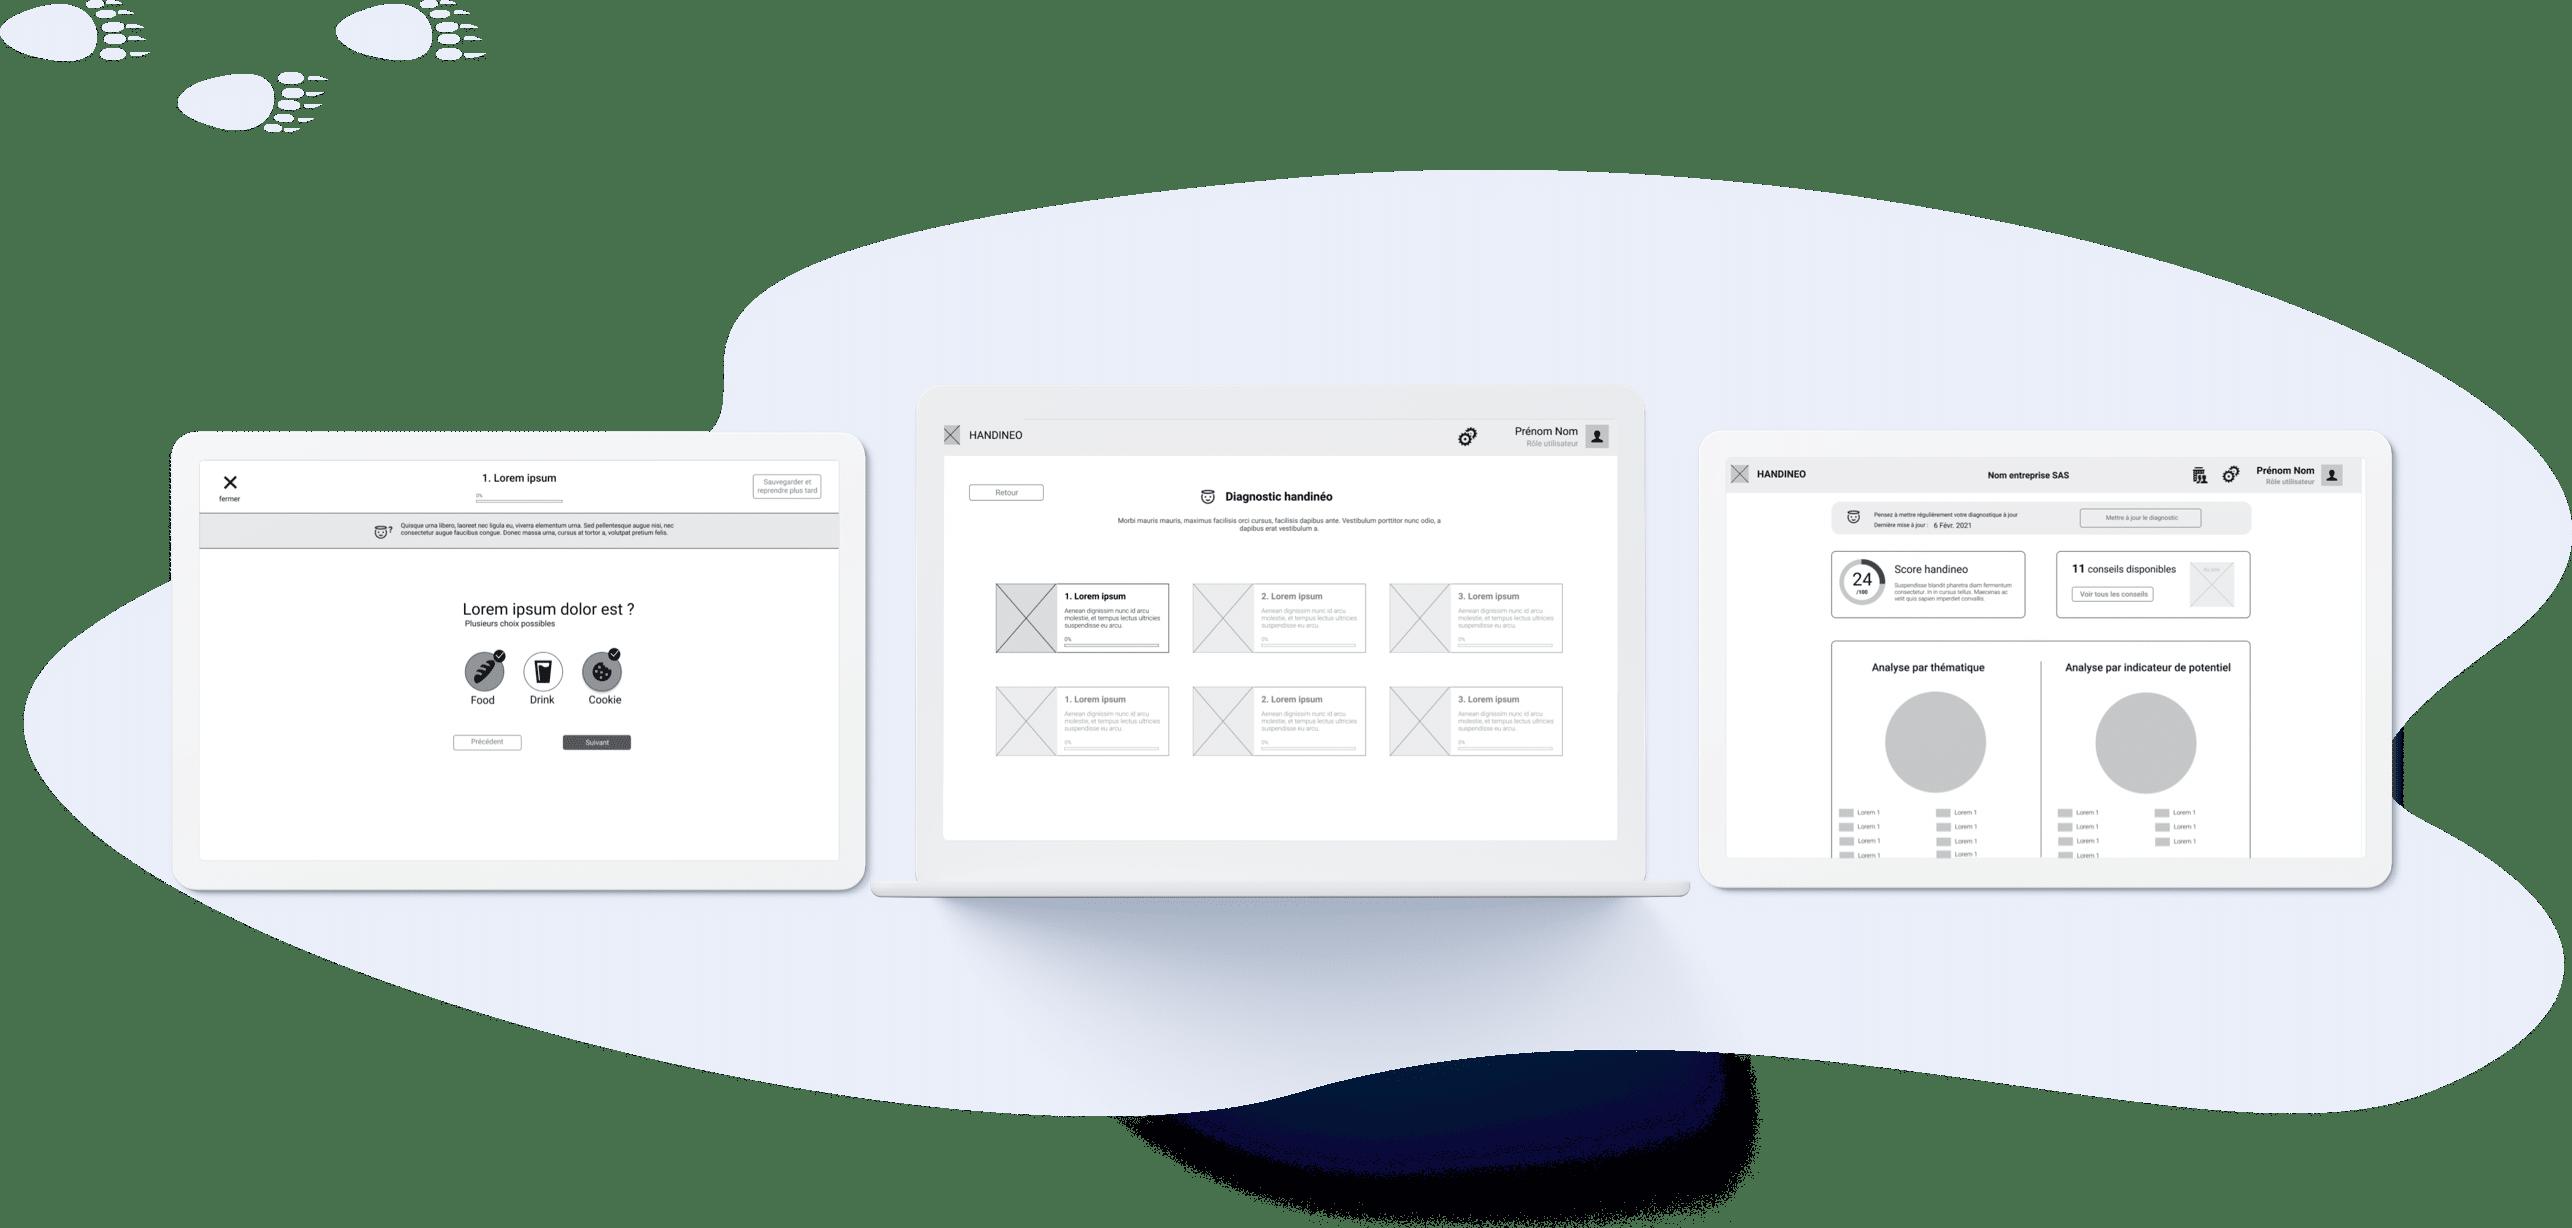 Handineo - Conception UX (desktop)